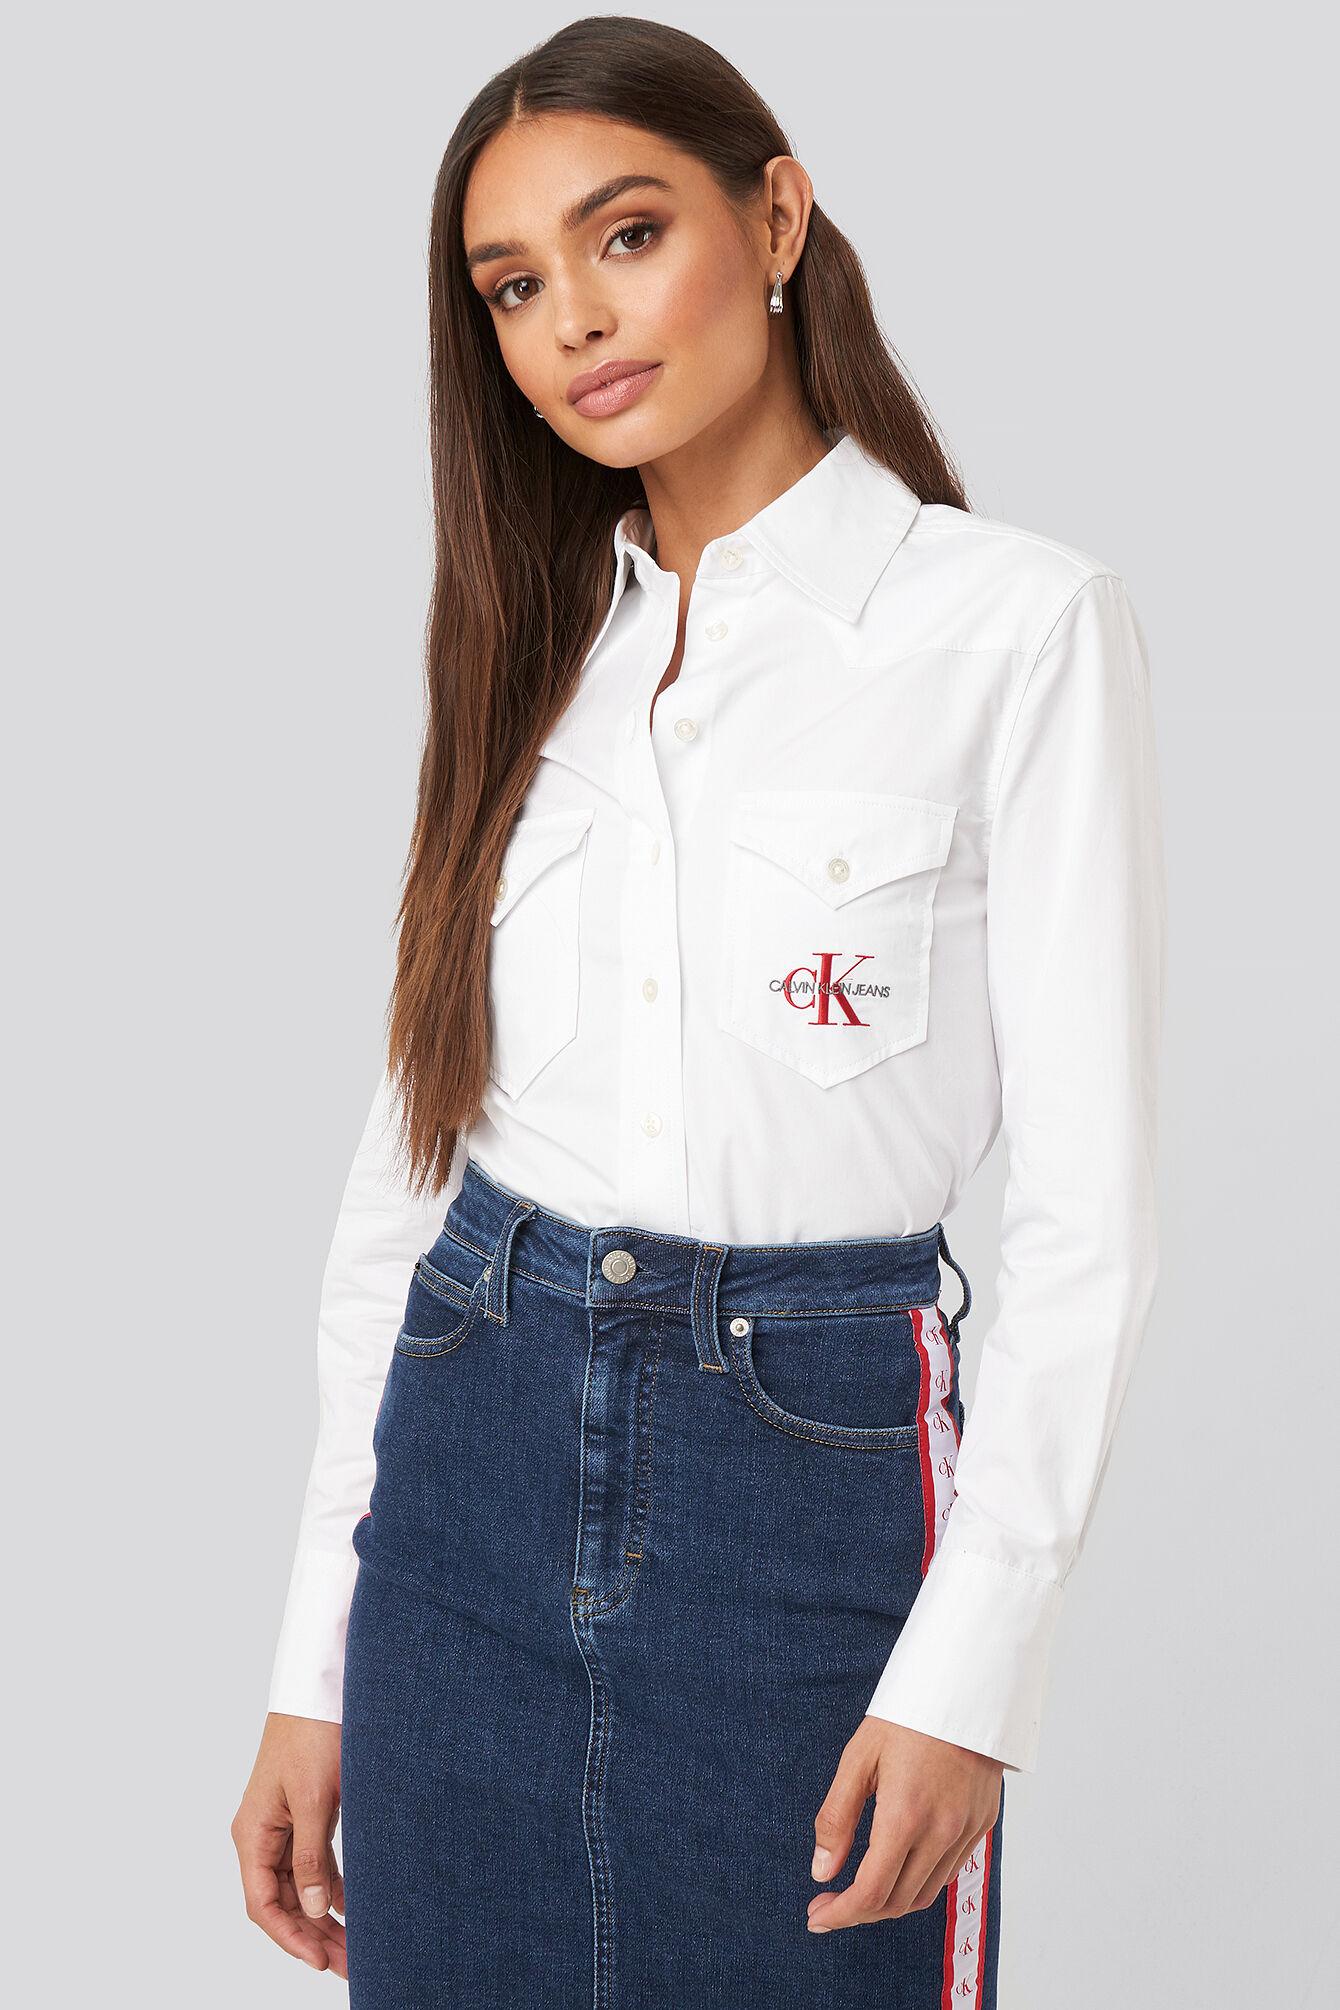 Calvin Klein Cotton Satin Western Crop Shirt - White  - Size: Small